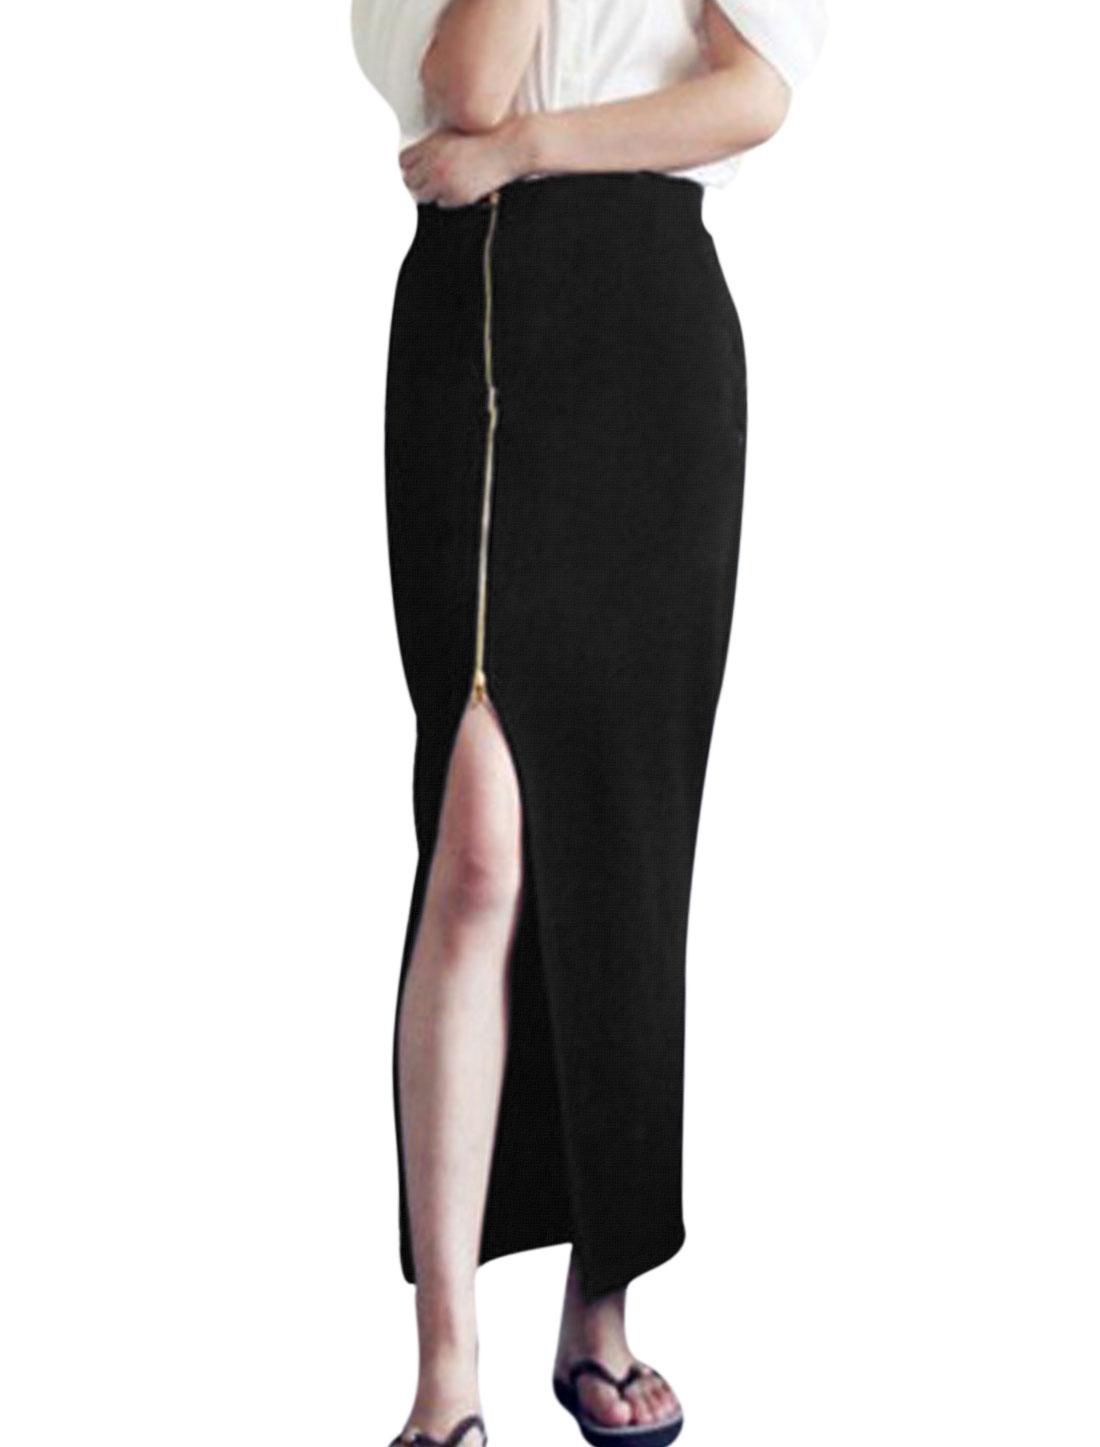 Lady Elastic Waist Side Zipper Side Split Stylish Knitted Skirt Black M